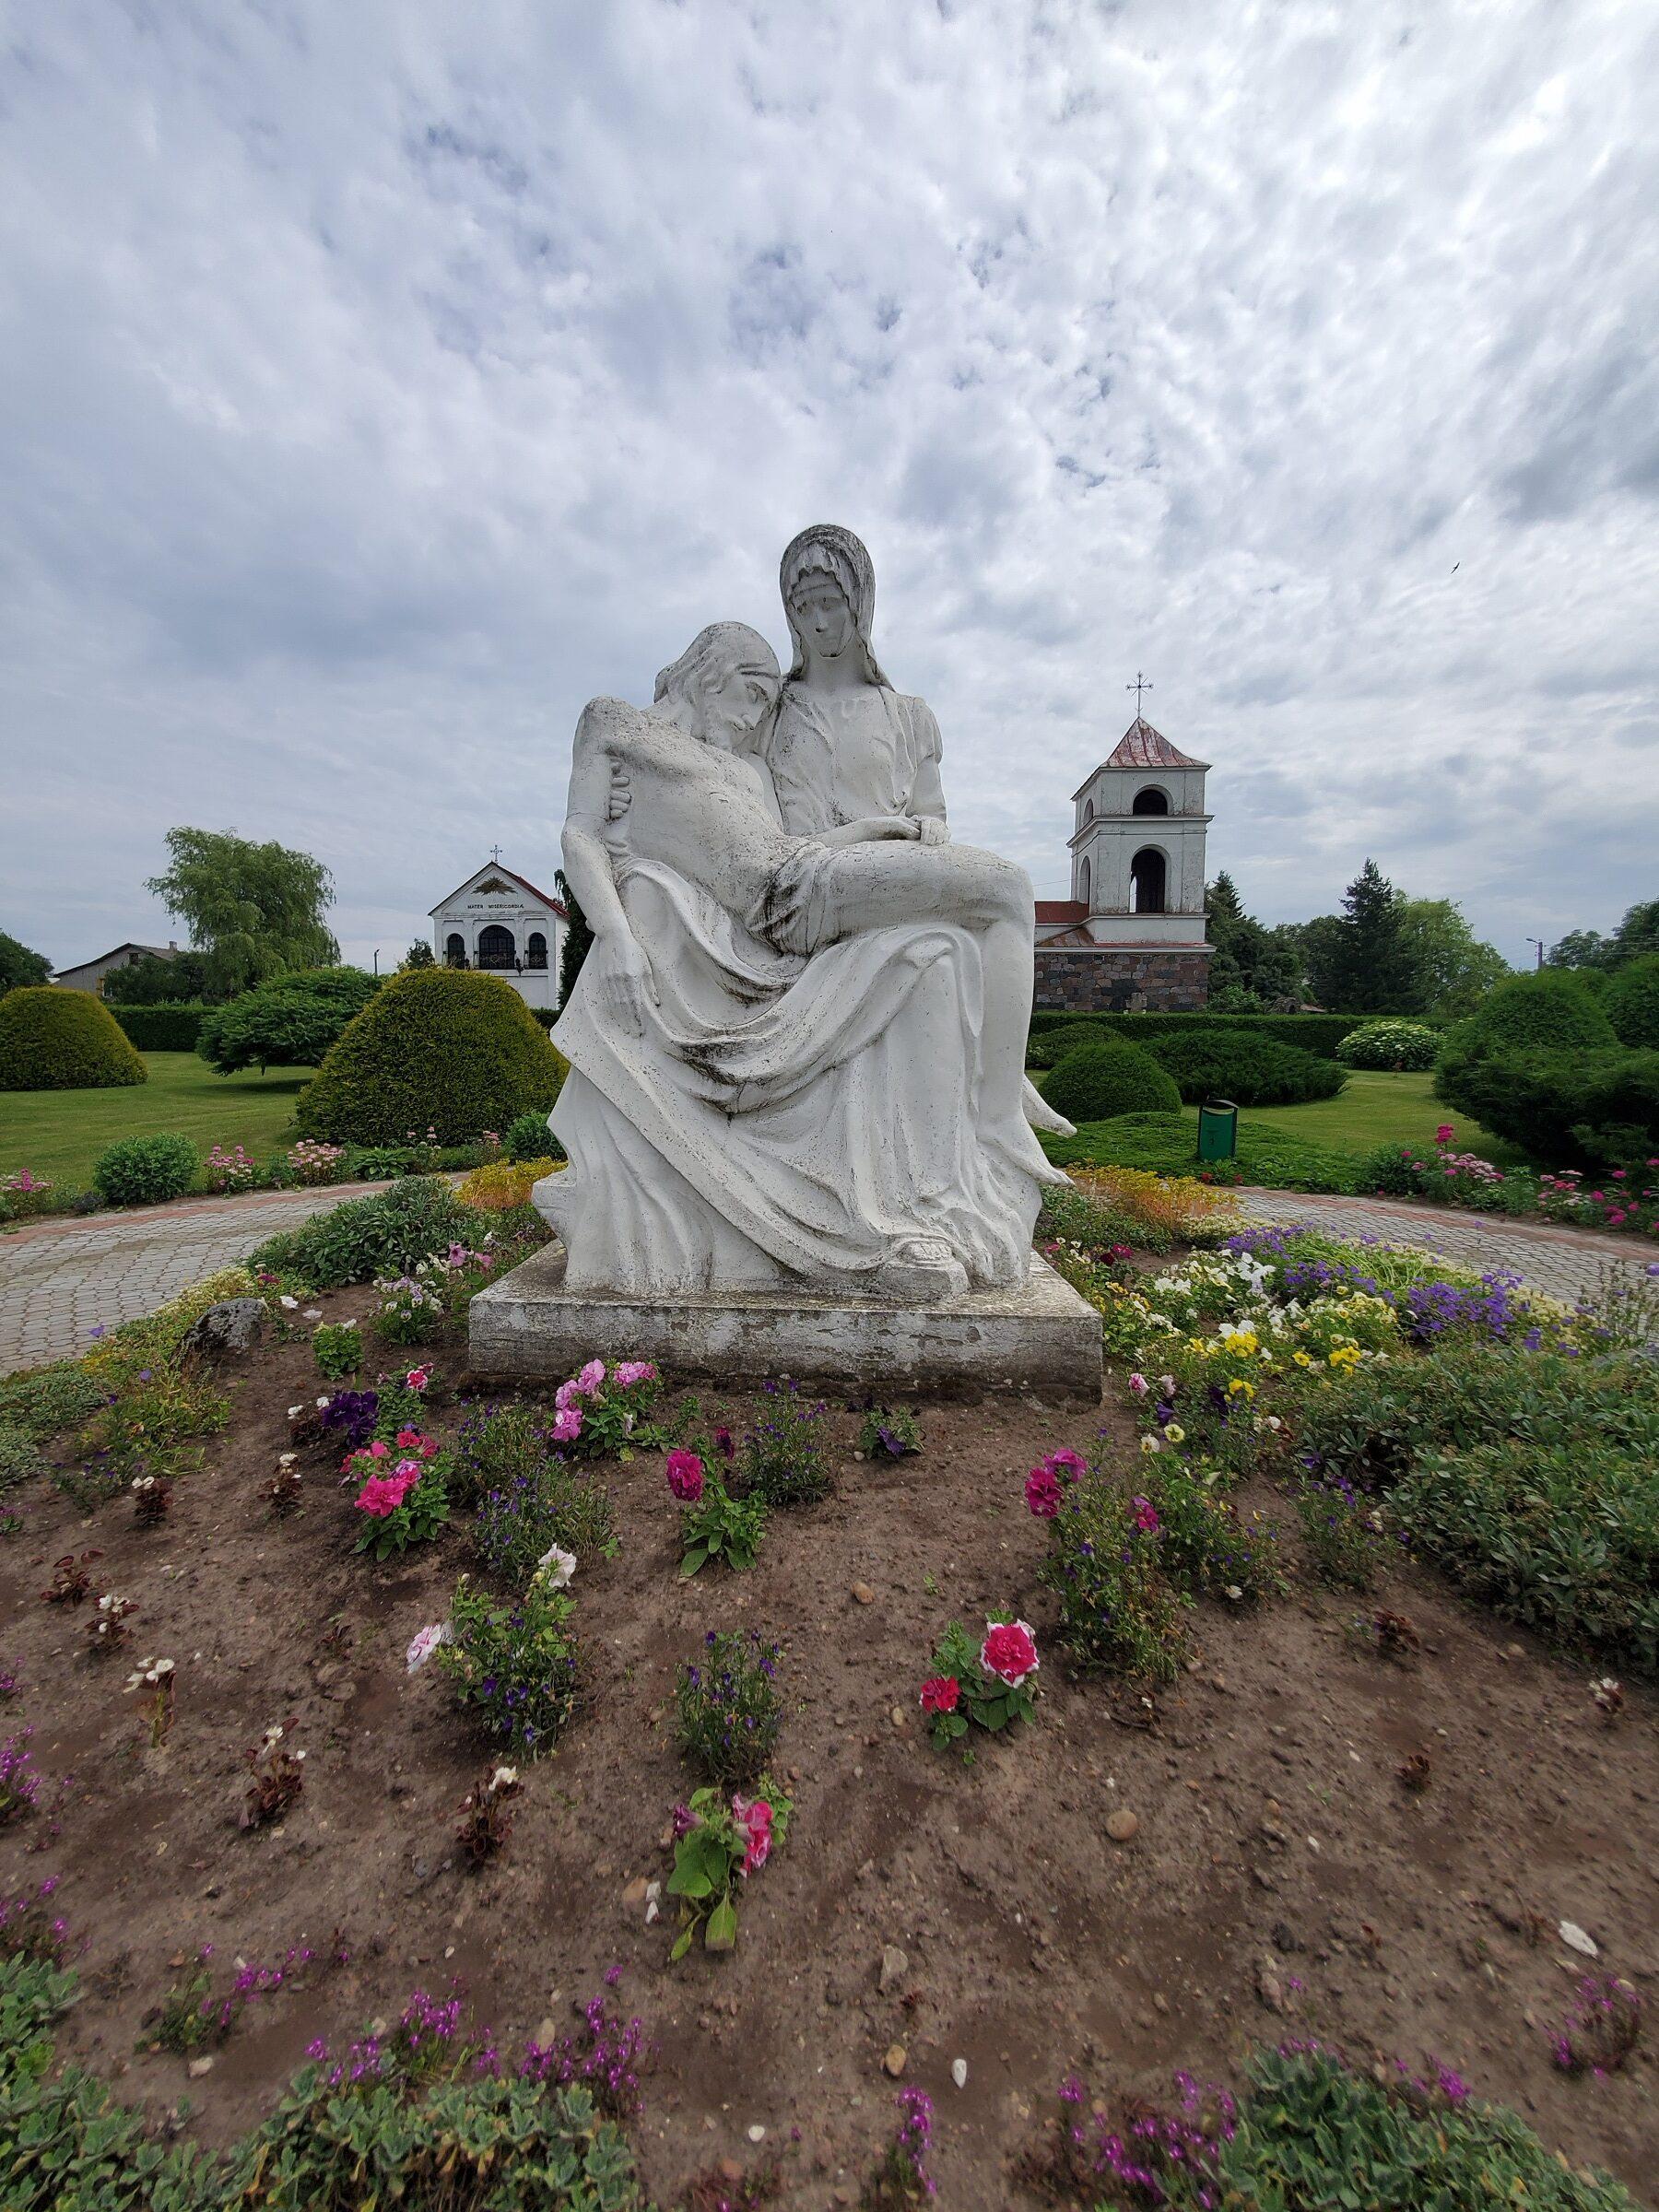 20200703 135717 rotated - Копия статуи Микеланджело в деревне Мосар